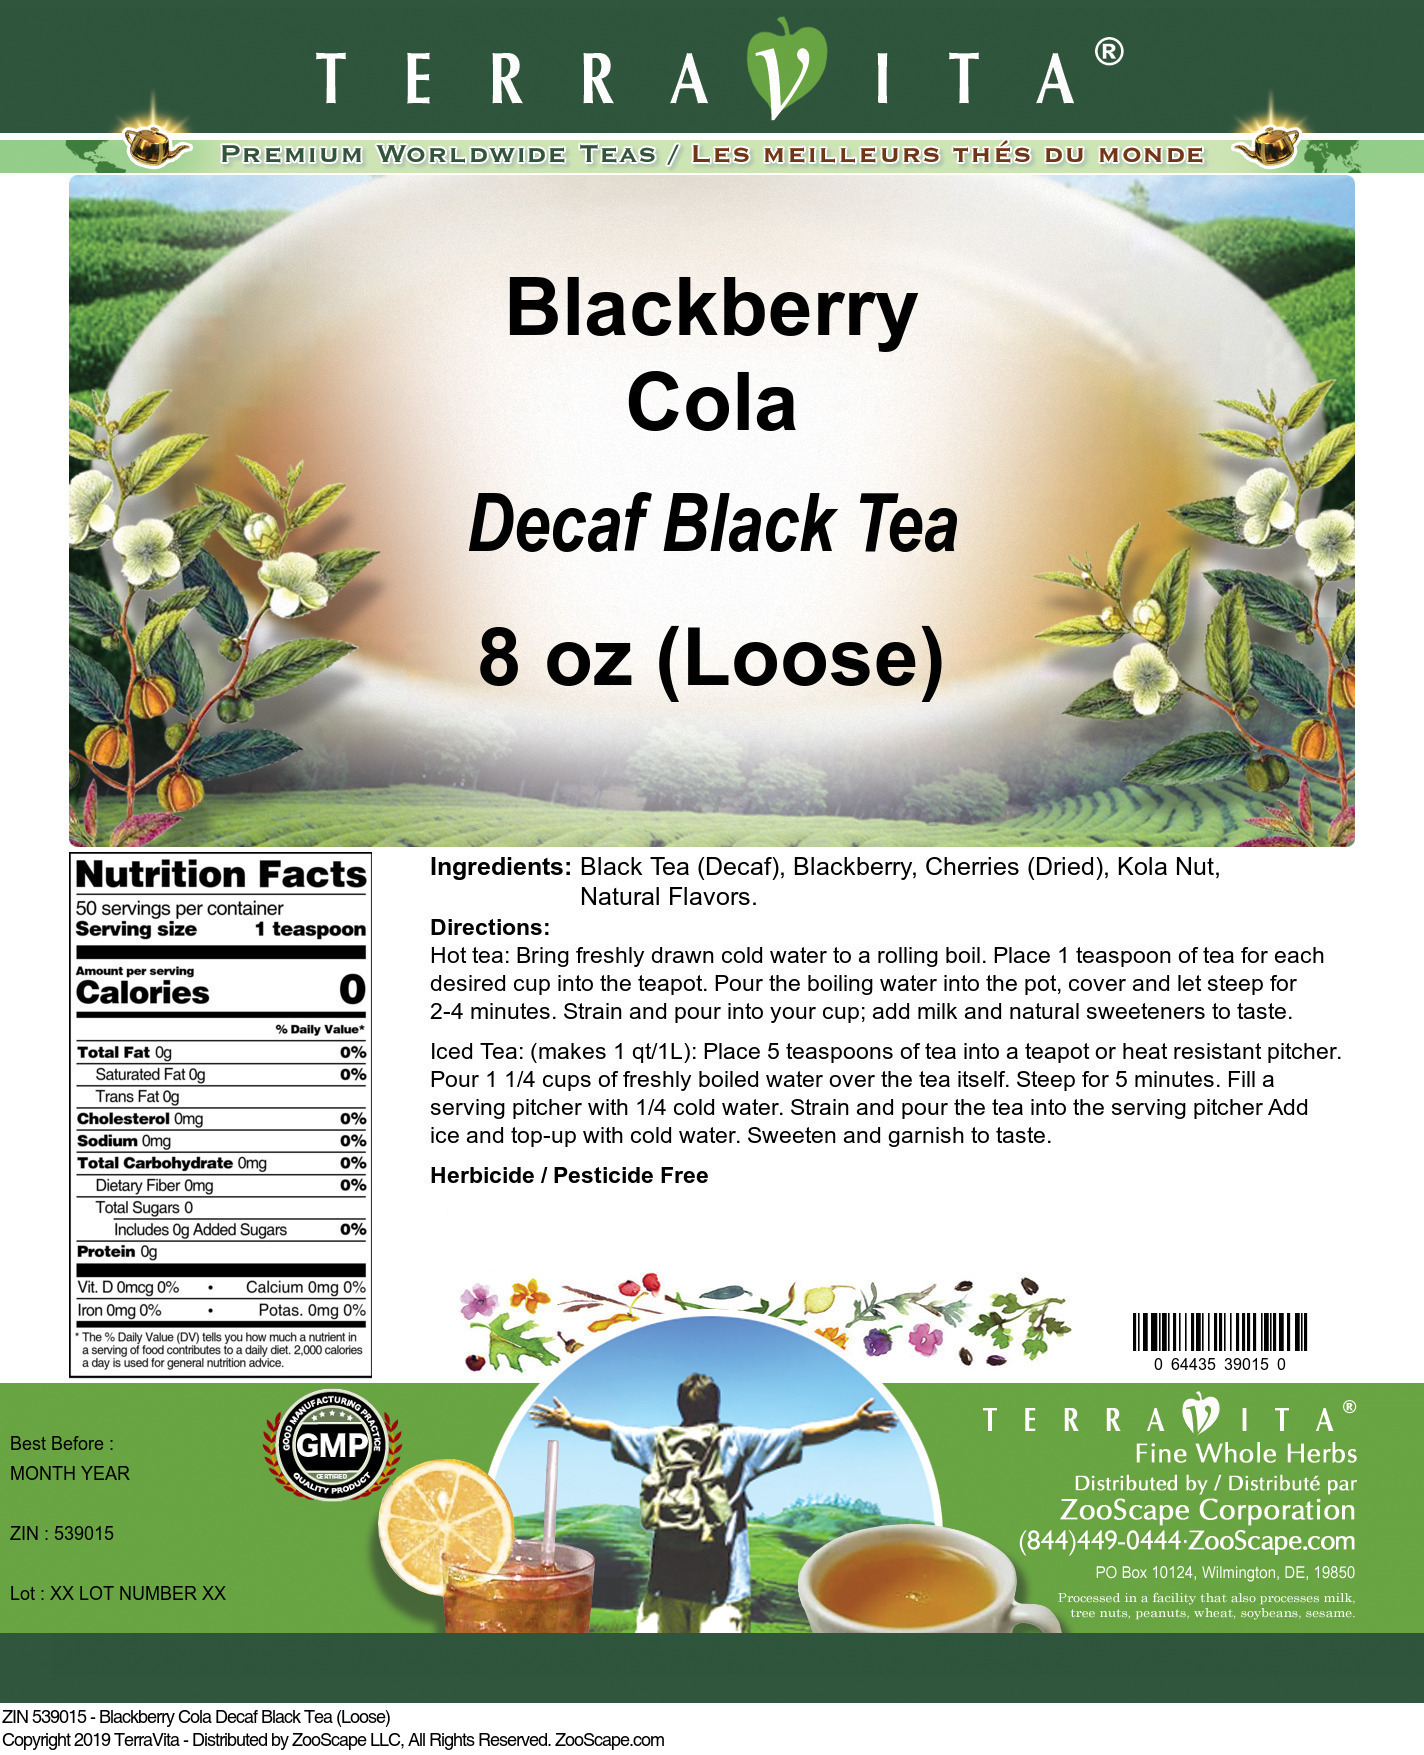 Blackberry Cola Decaf Black Tea